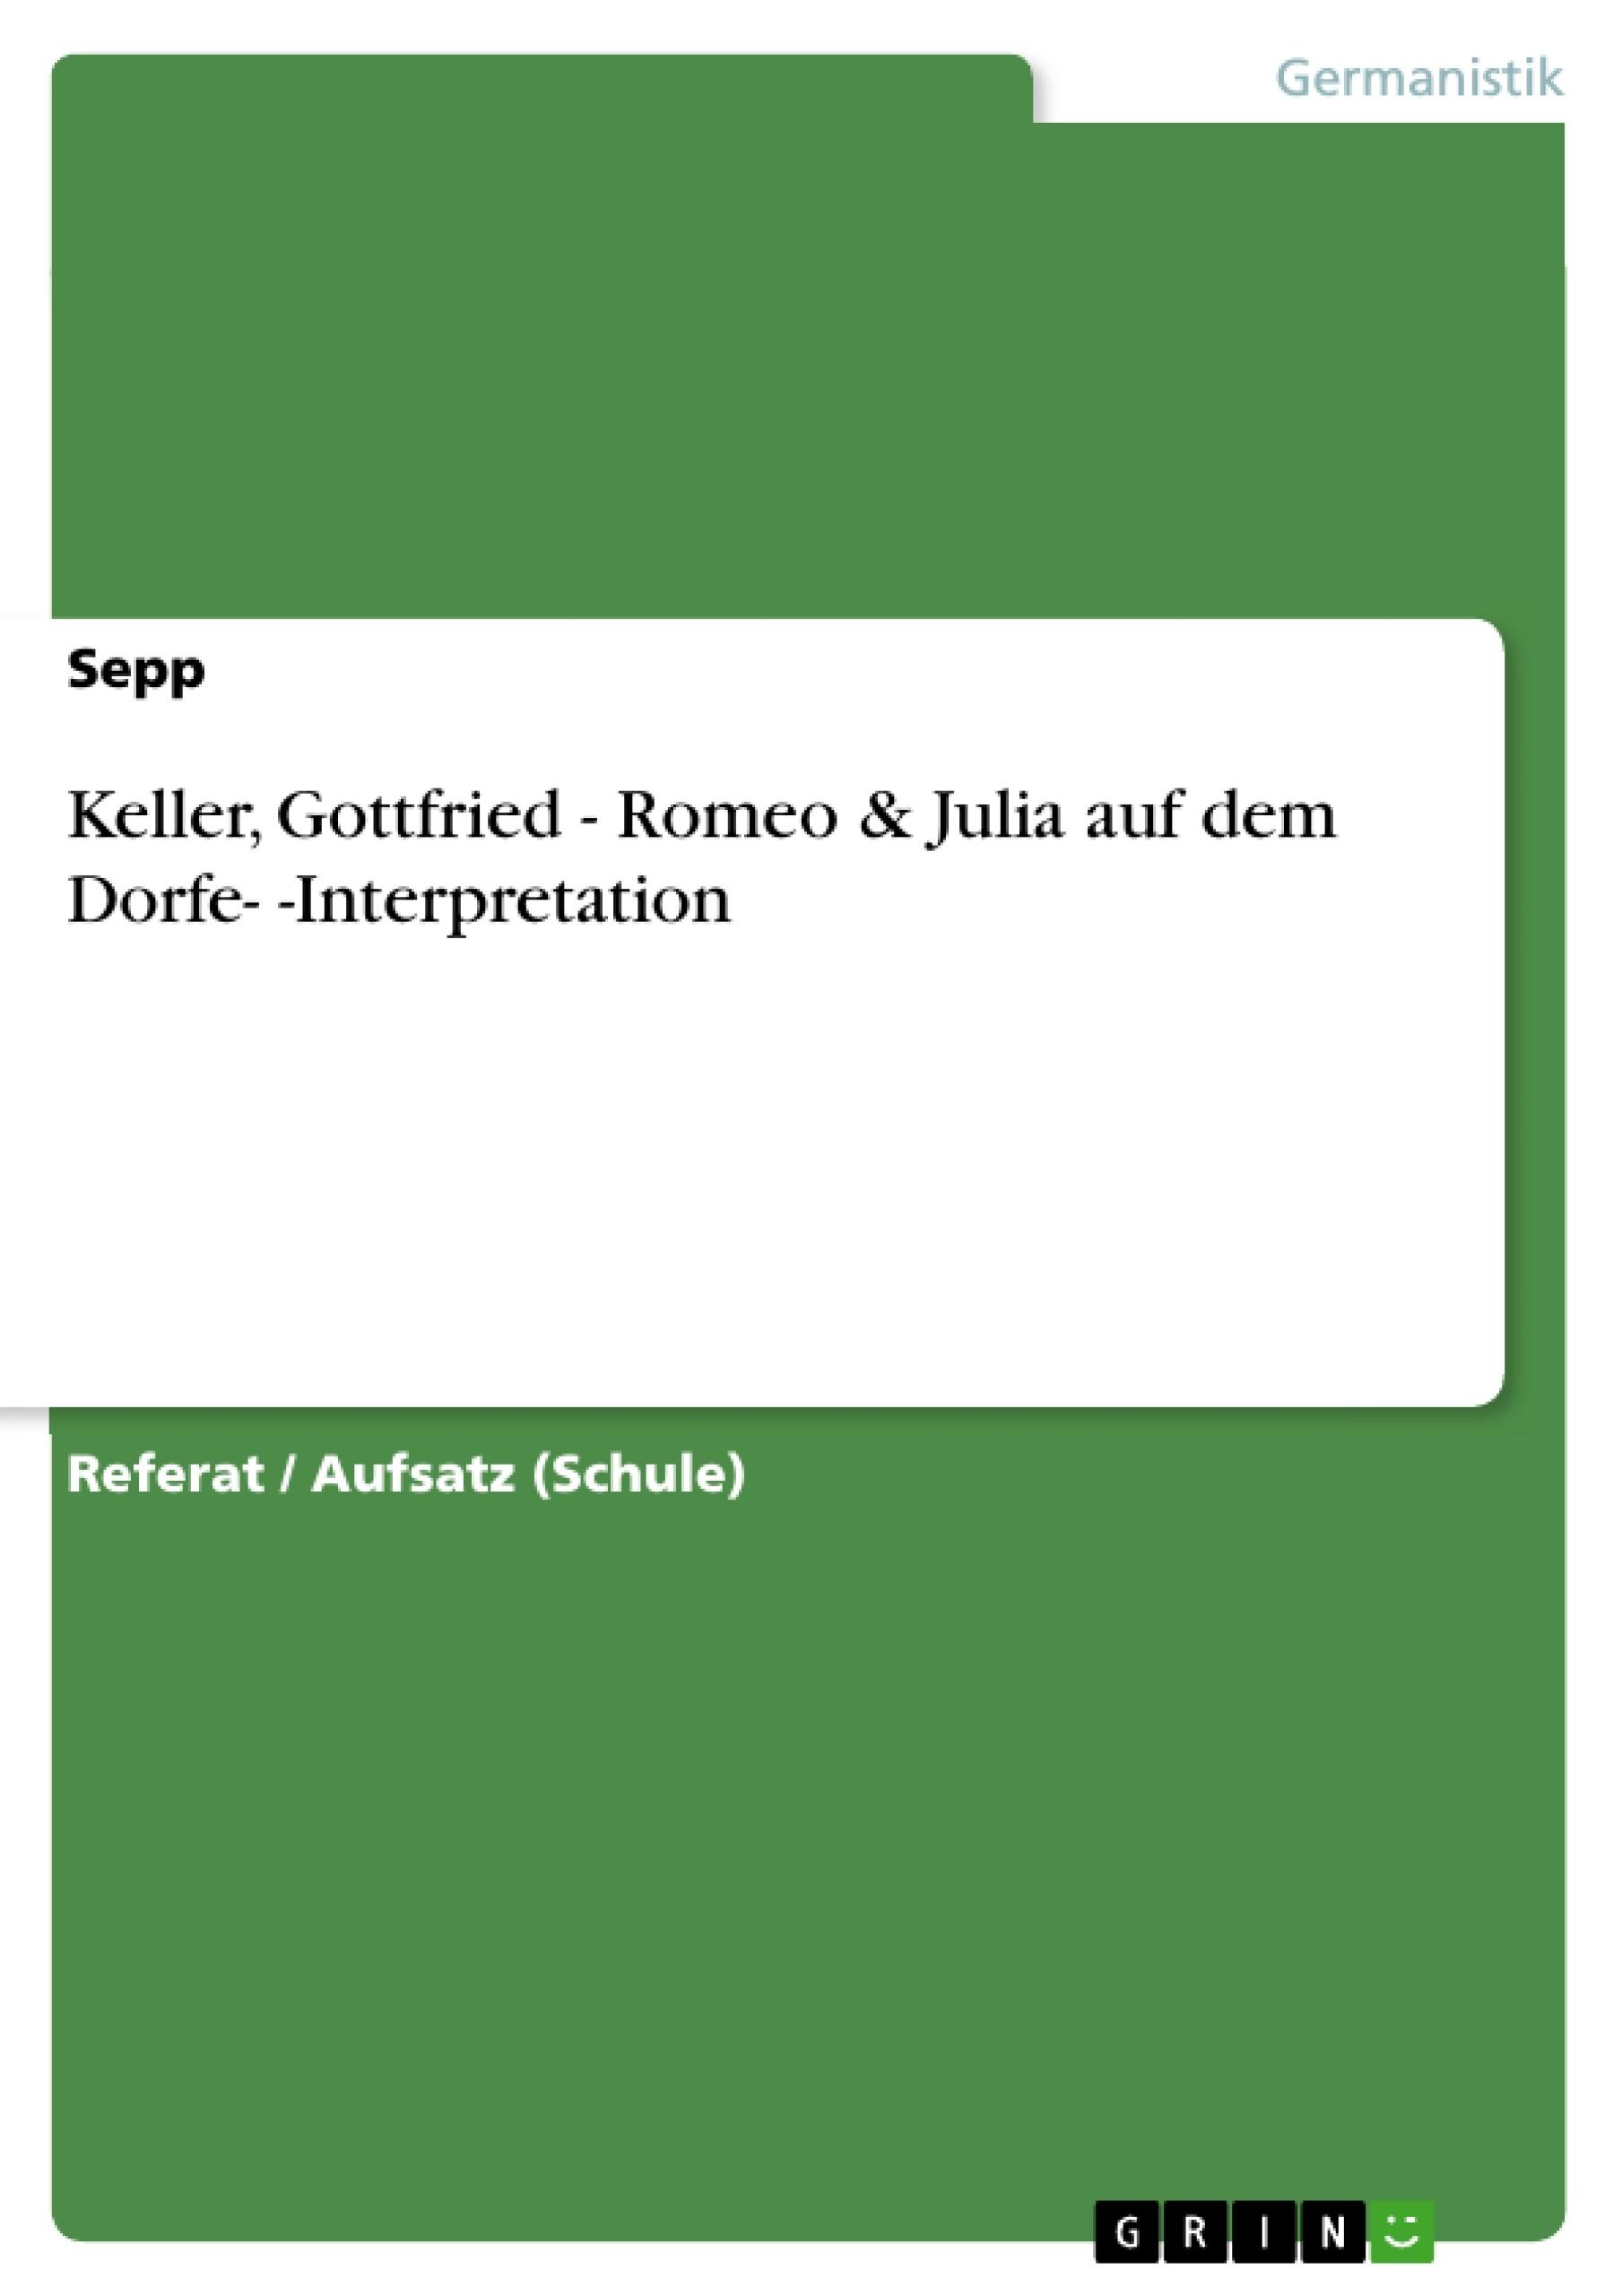 Titel: Keller, Gottfried - Romeo & Julia auf dem Dorfe- -Interpretation